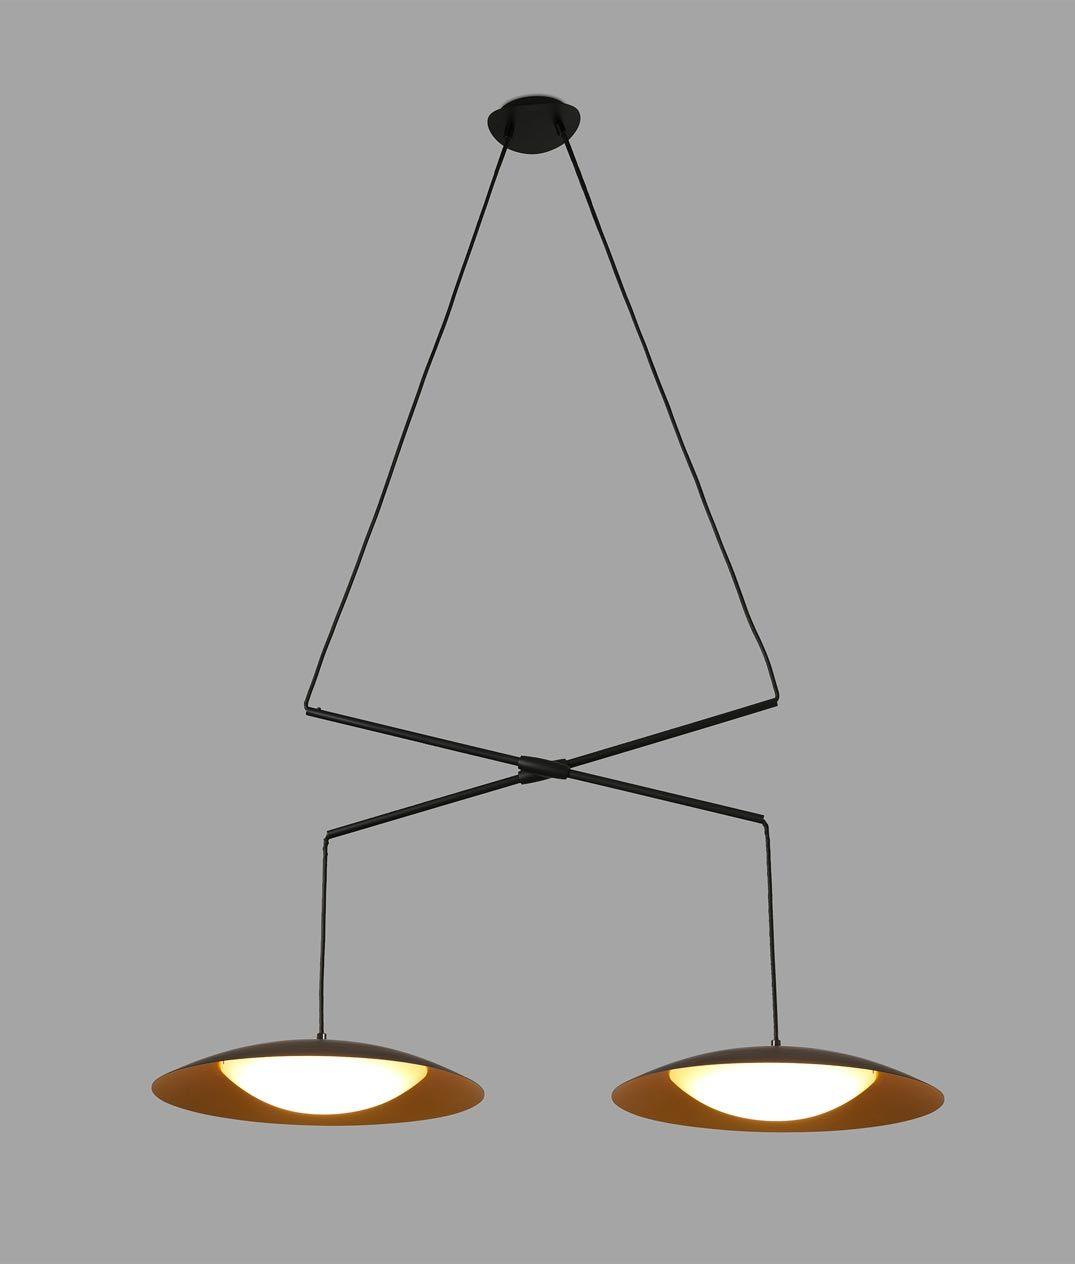 L mpara doble extensible negra oro slim led - Casa de las lamparas ...